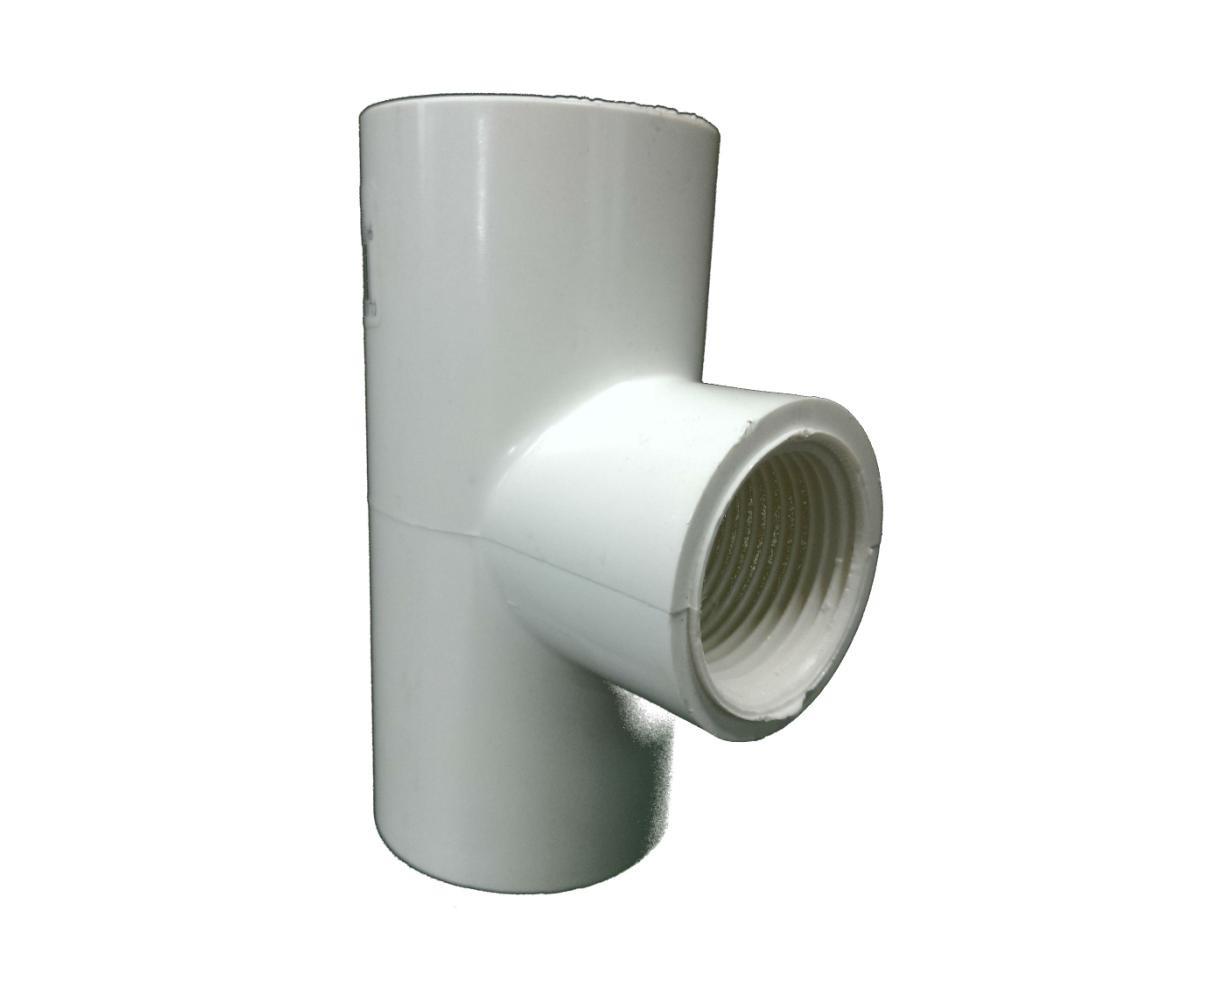 Tee Faucet PVC